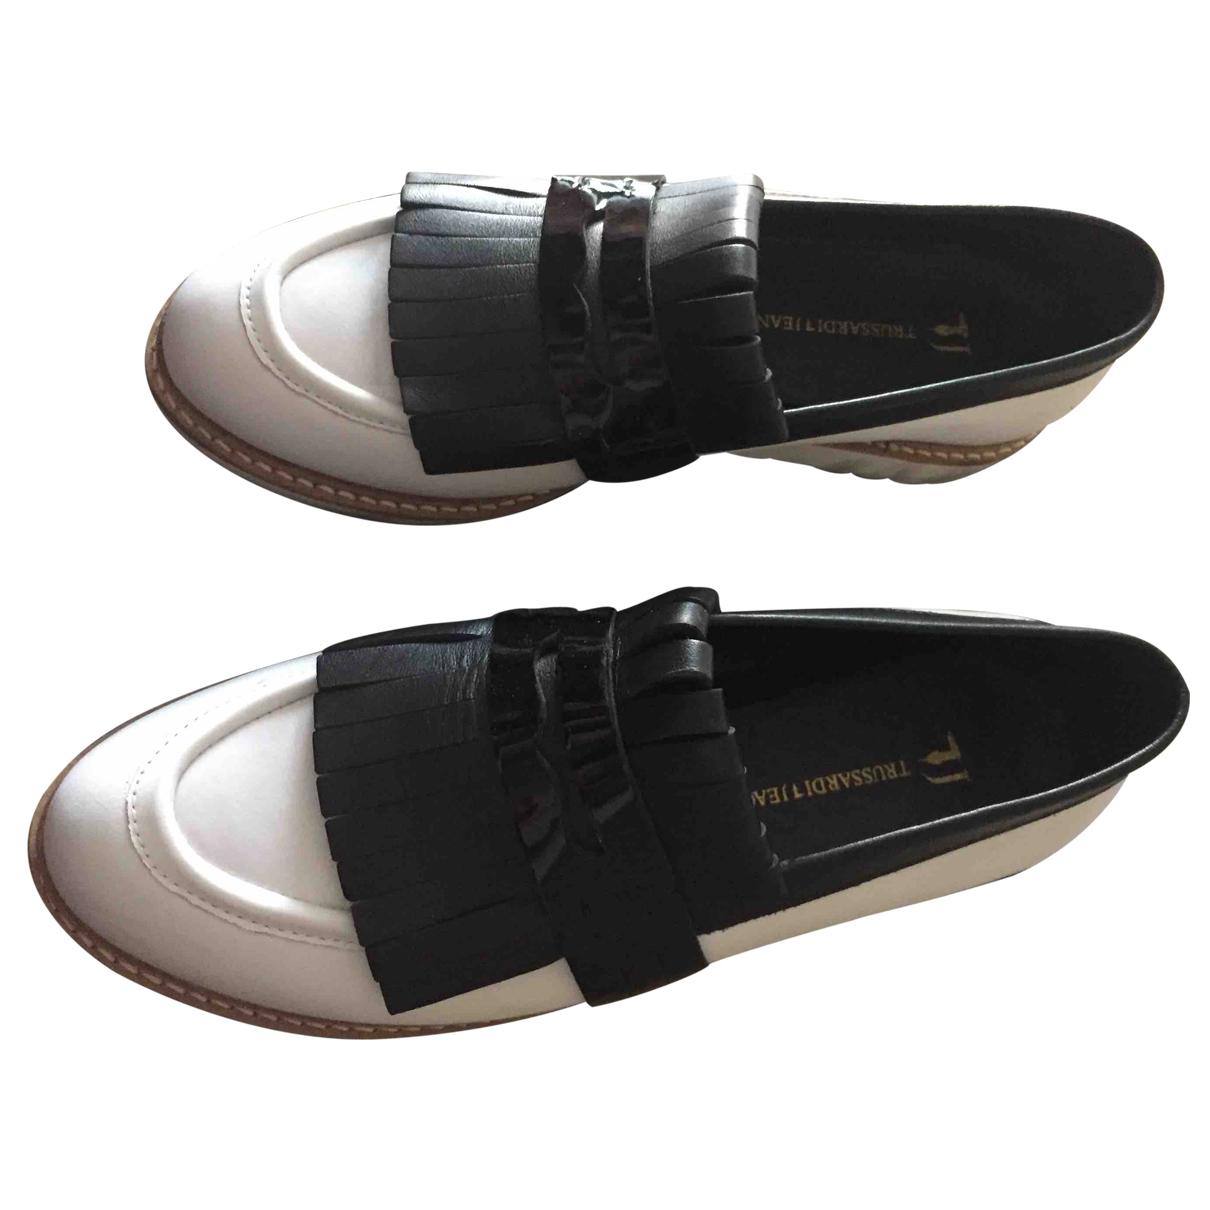 Trussardi N White Leather Flats for Women 37 EU